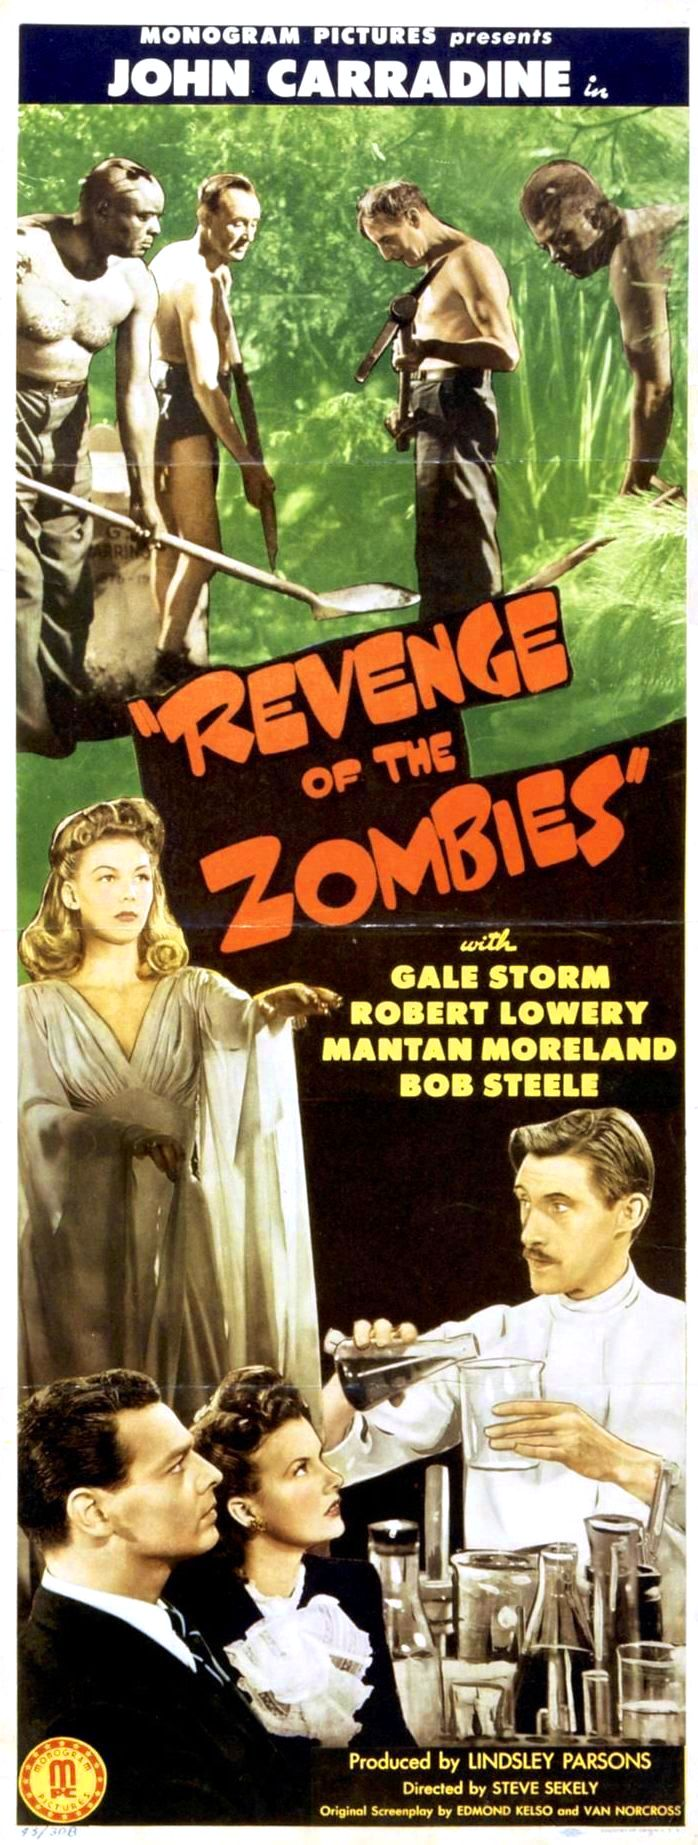 revenge-of-the-zombies-3